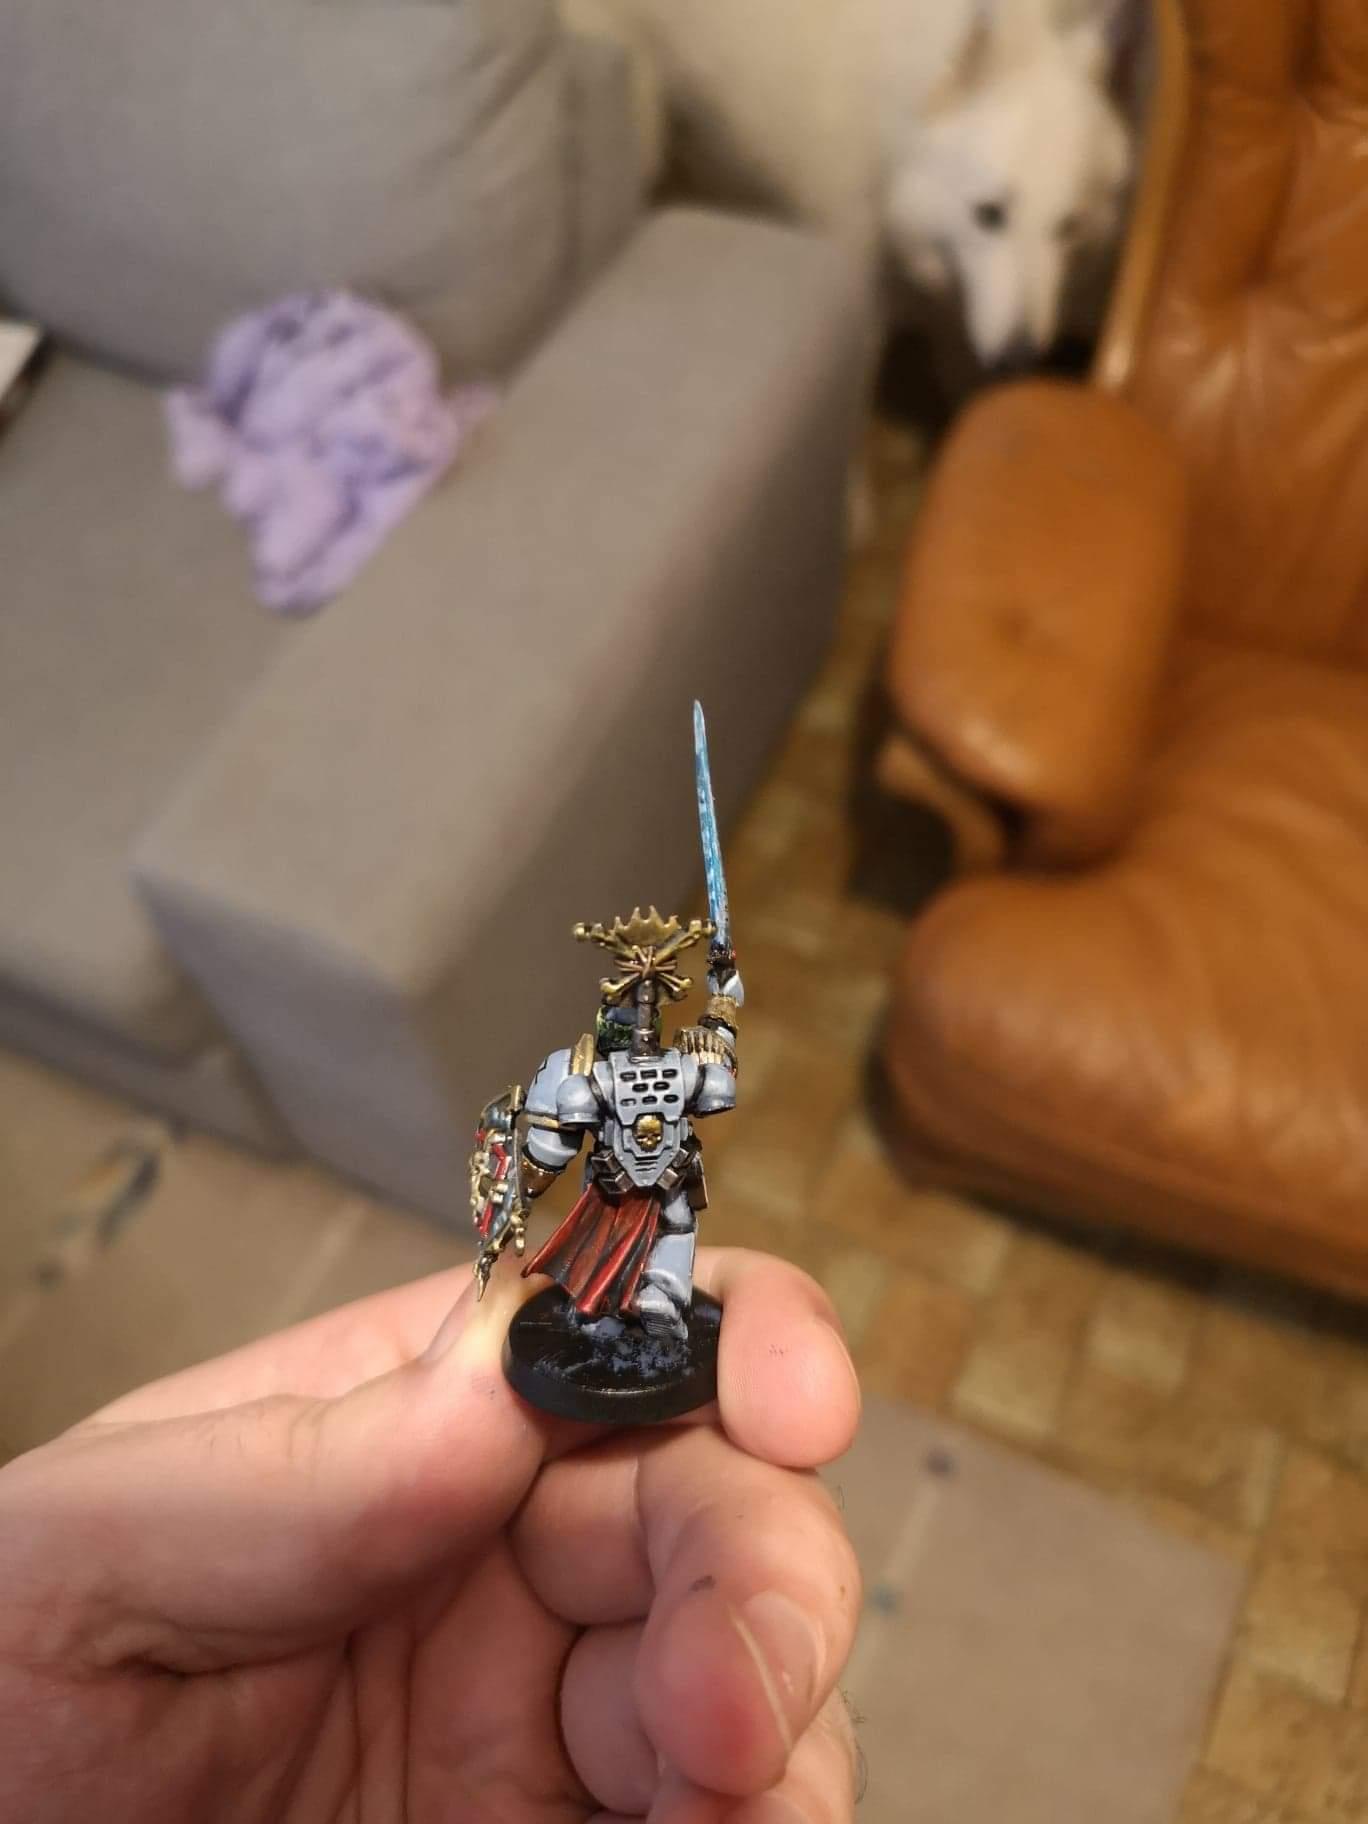 [Peinture] [Warhammer 40,000] Champion de l'empereur Space wolves  Receiv16